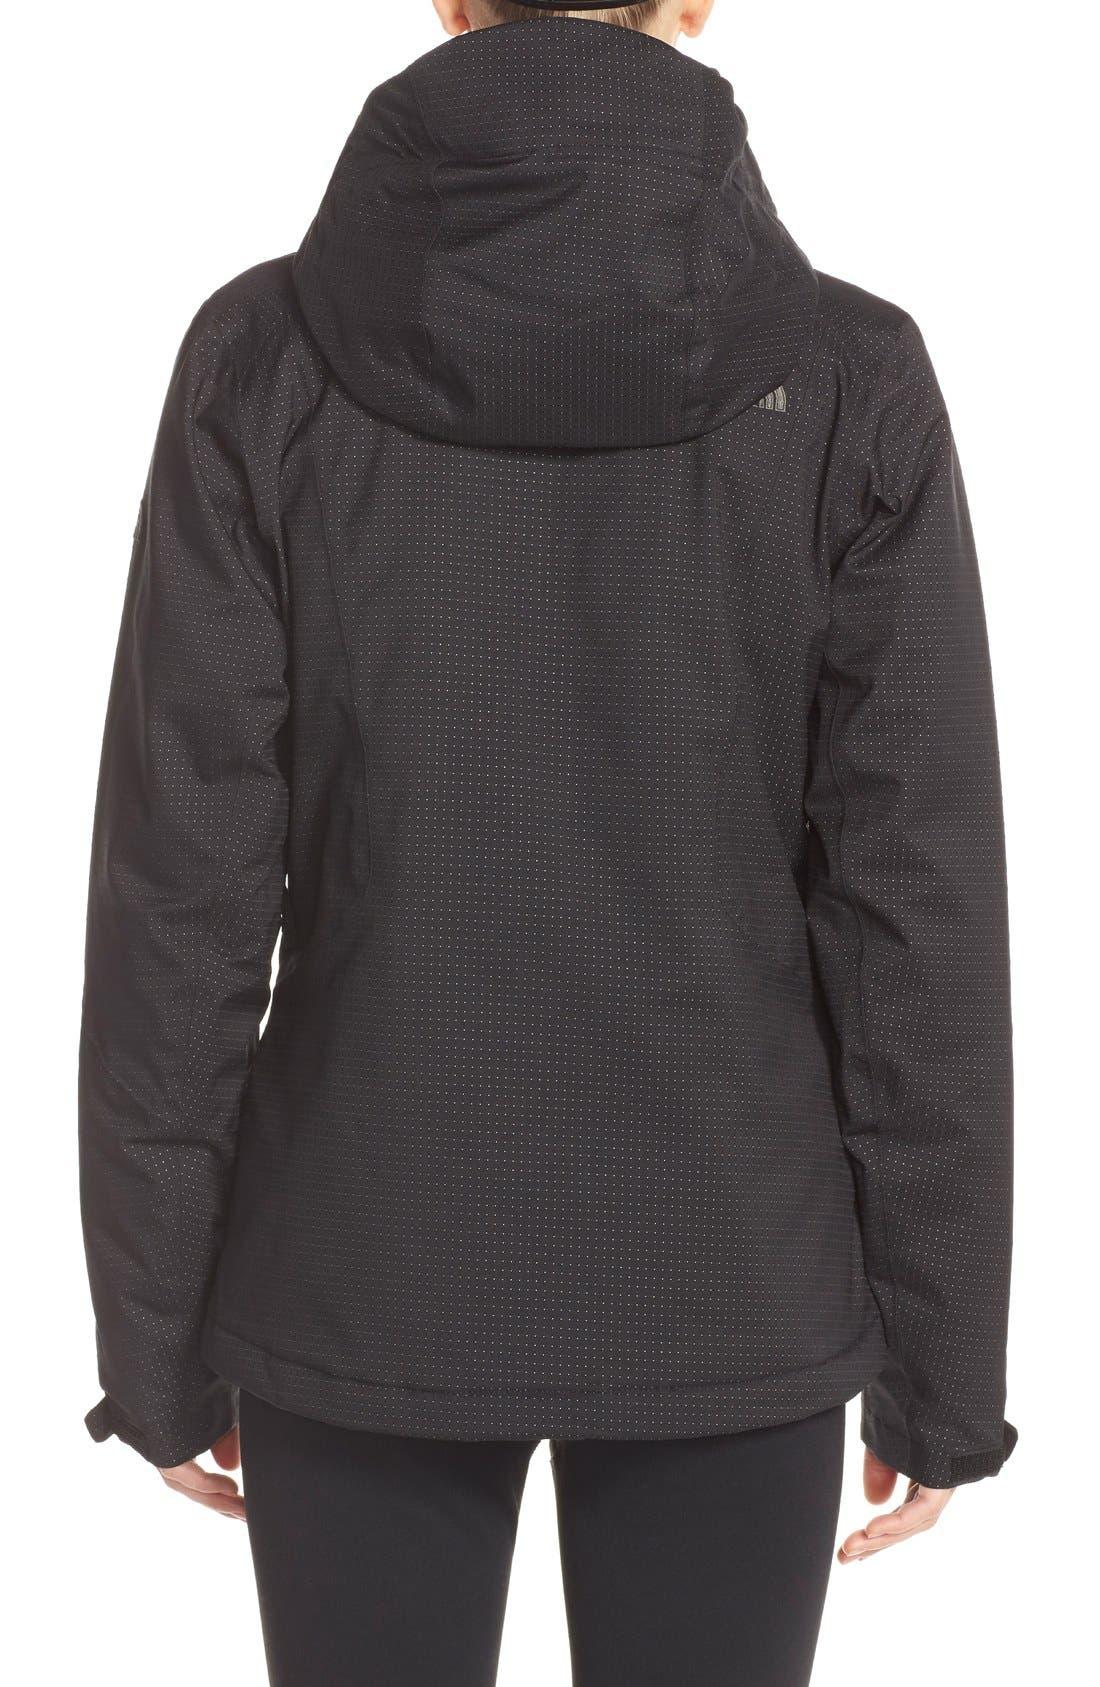 THE NORTH FACE,                             'Lulea' Waterpoof Heatseeker<sup>™</sup> Jacket,                             Alternate thumbnail 3, color,                             001